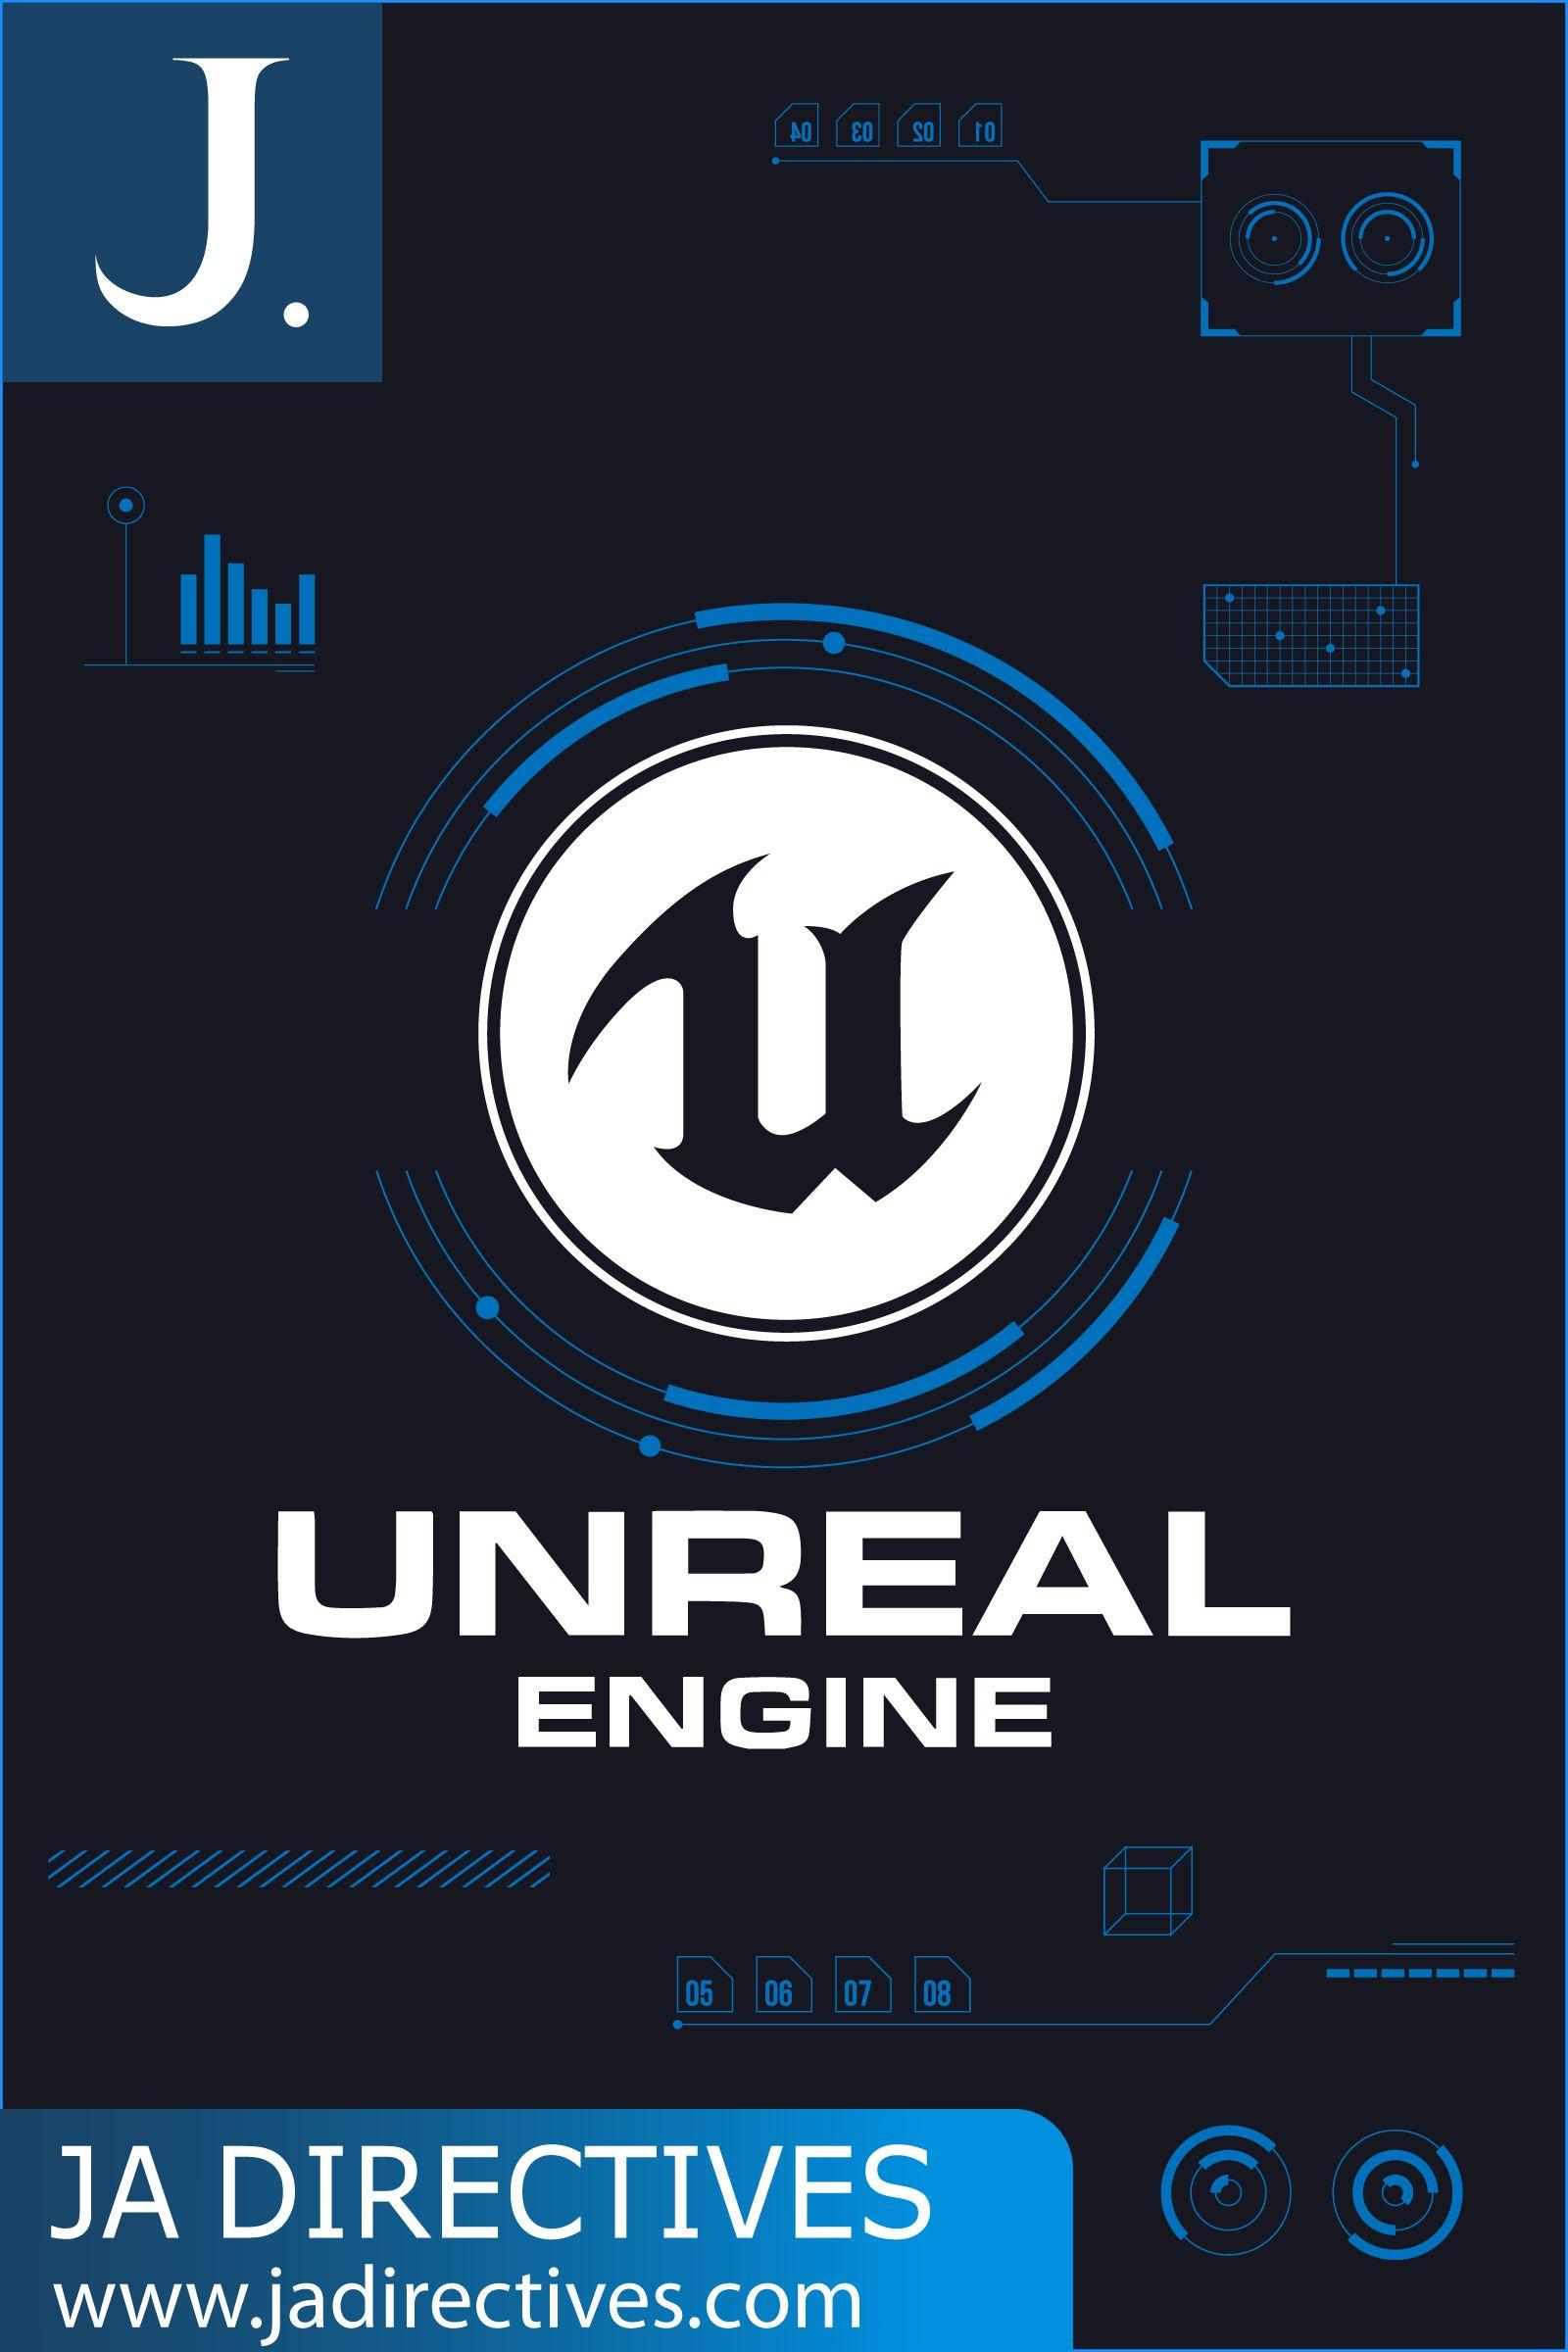 12 Best Unreal Engine 4 Tutorials, Courses & Training 2020